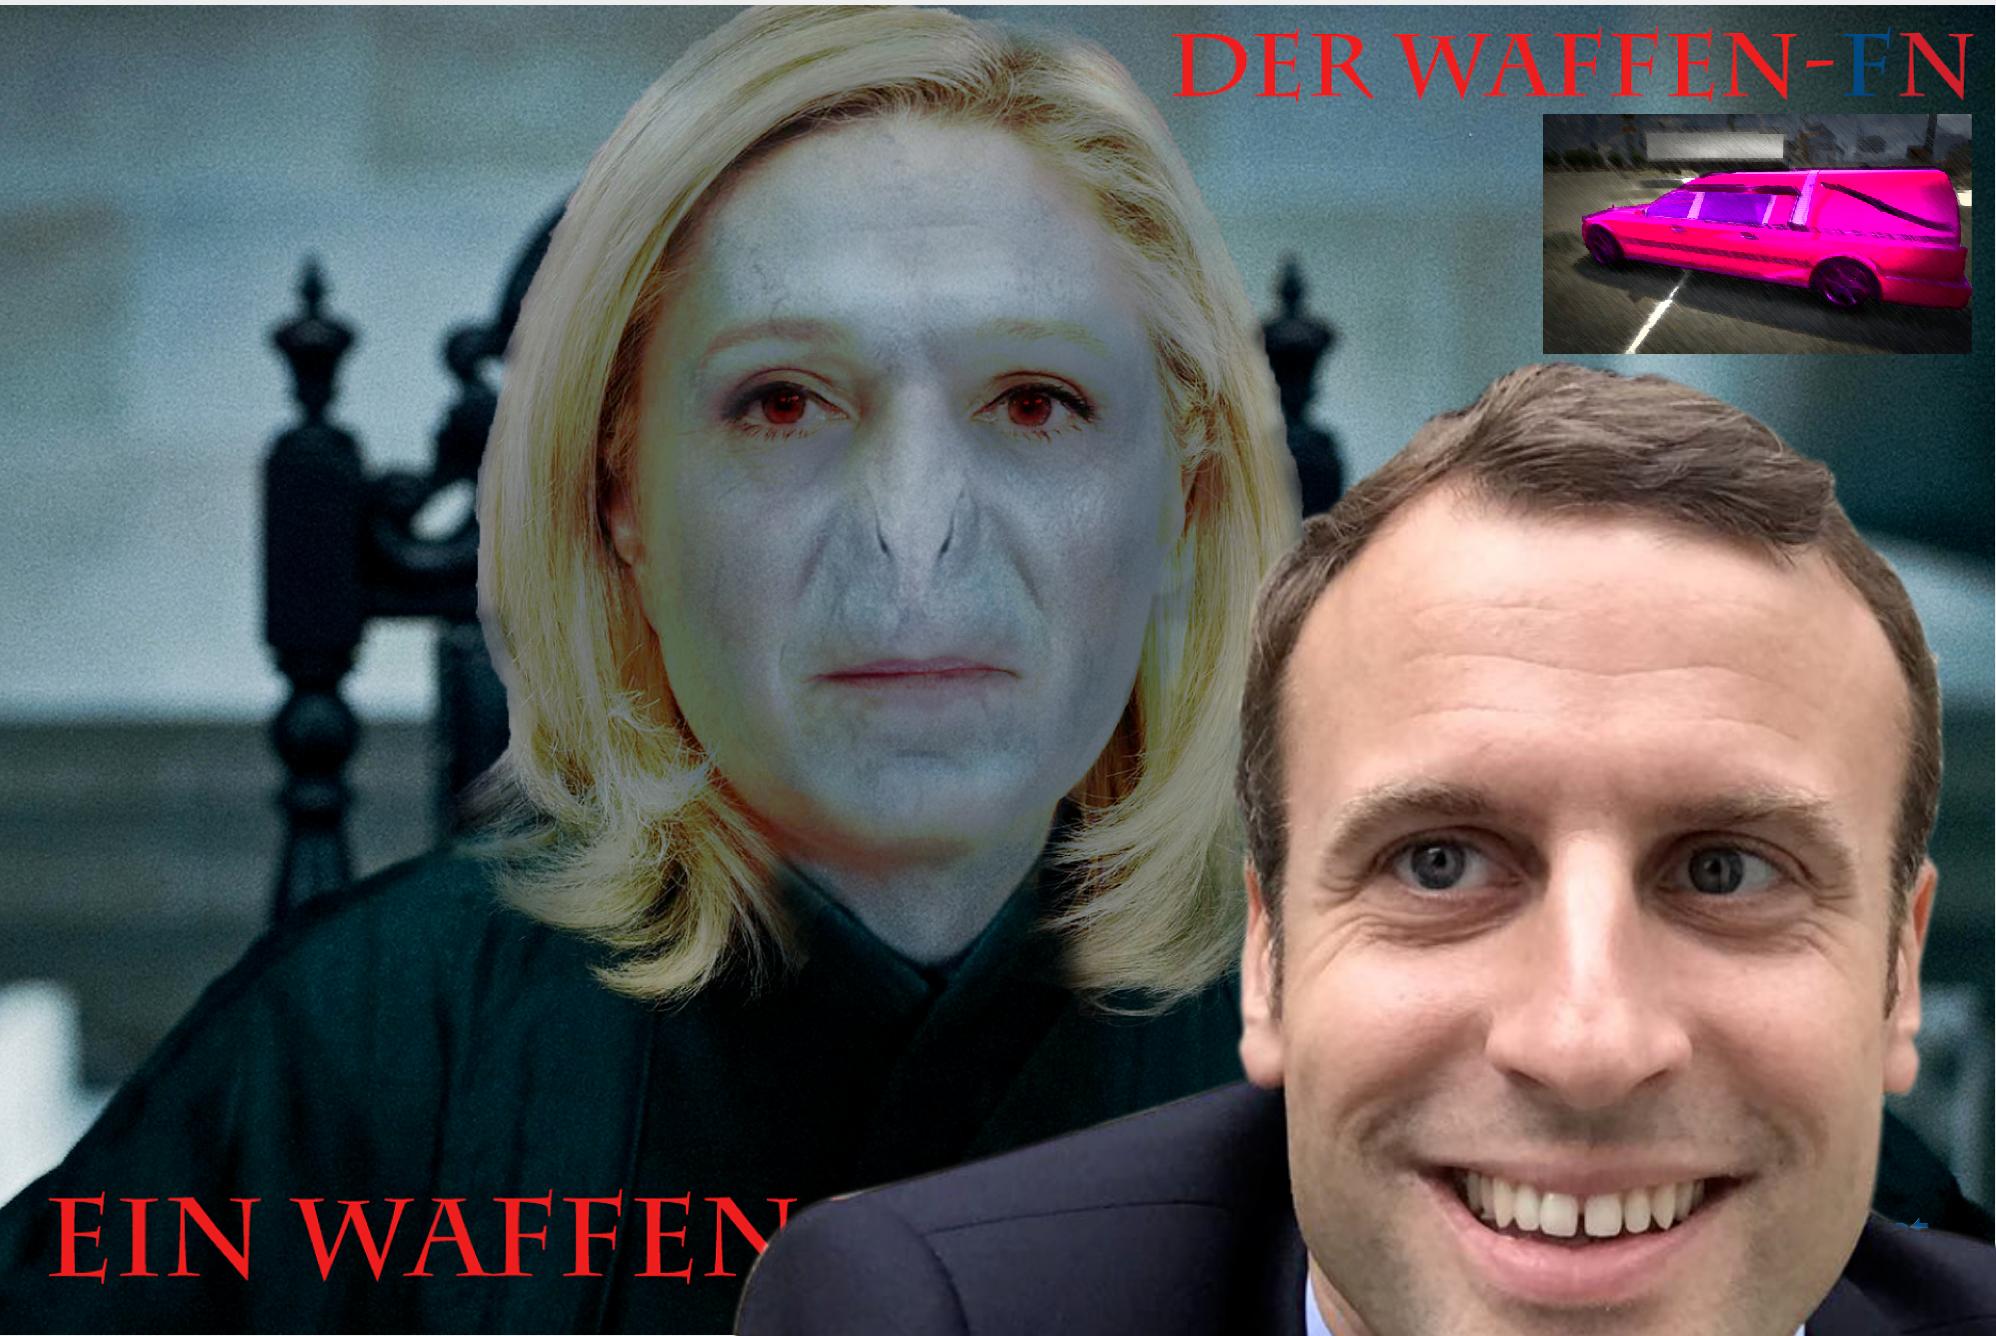 Sticker politic le pen macron tison corbillard fachos nul folle